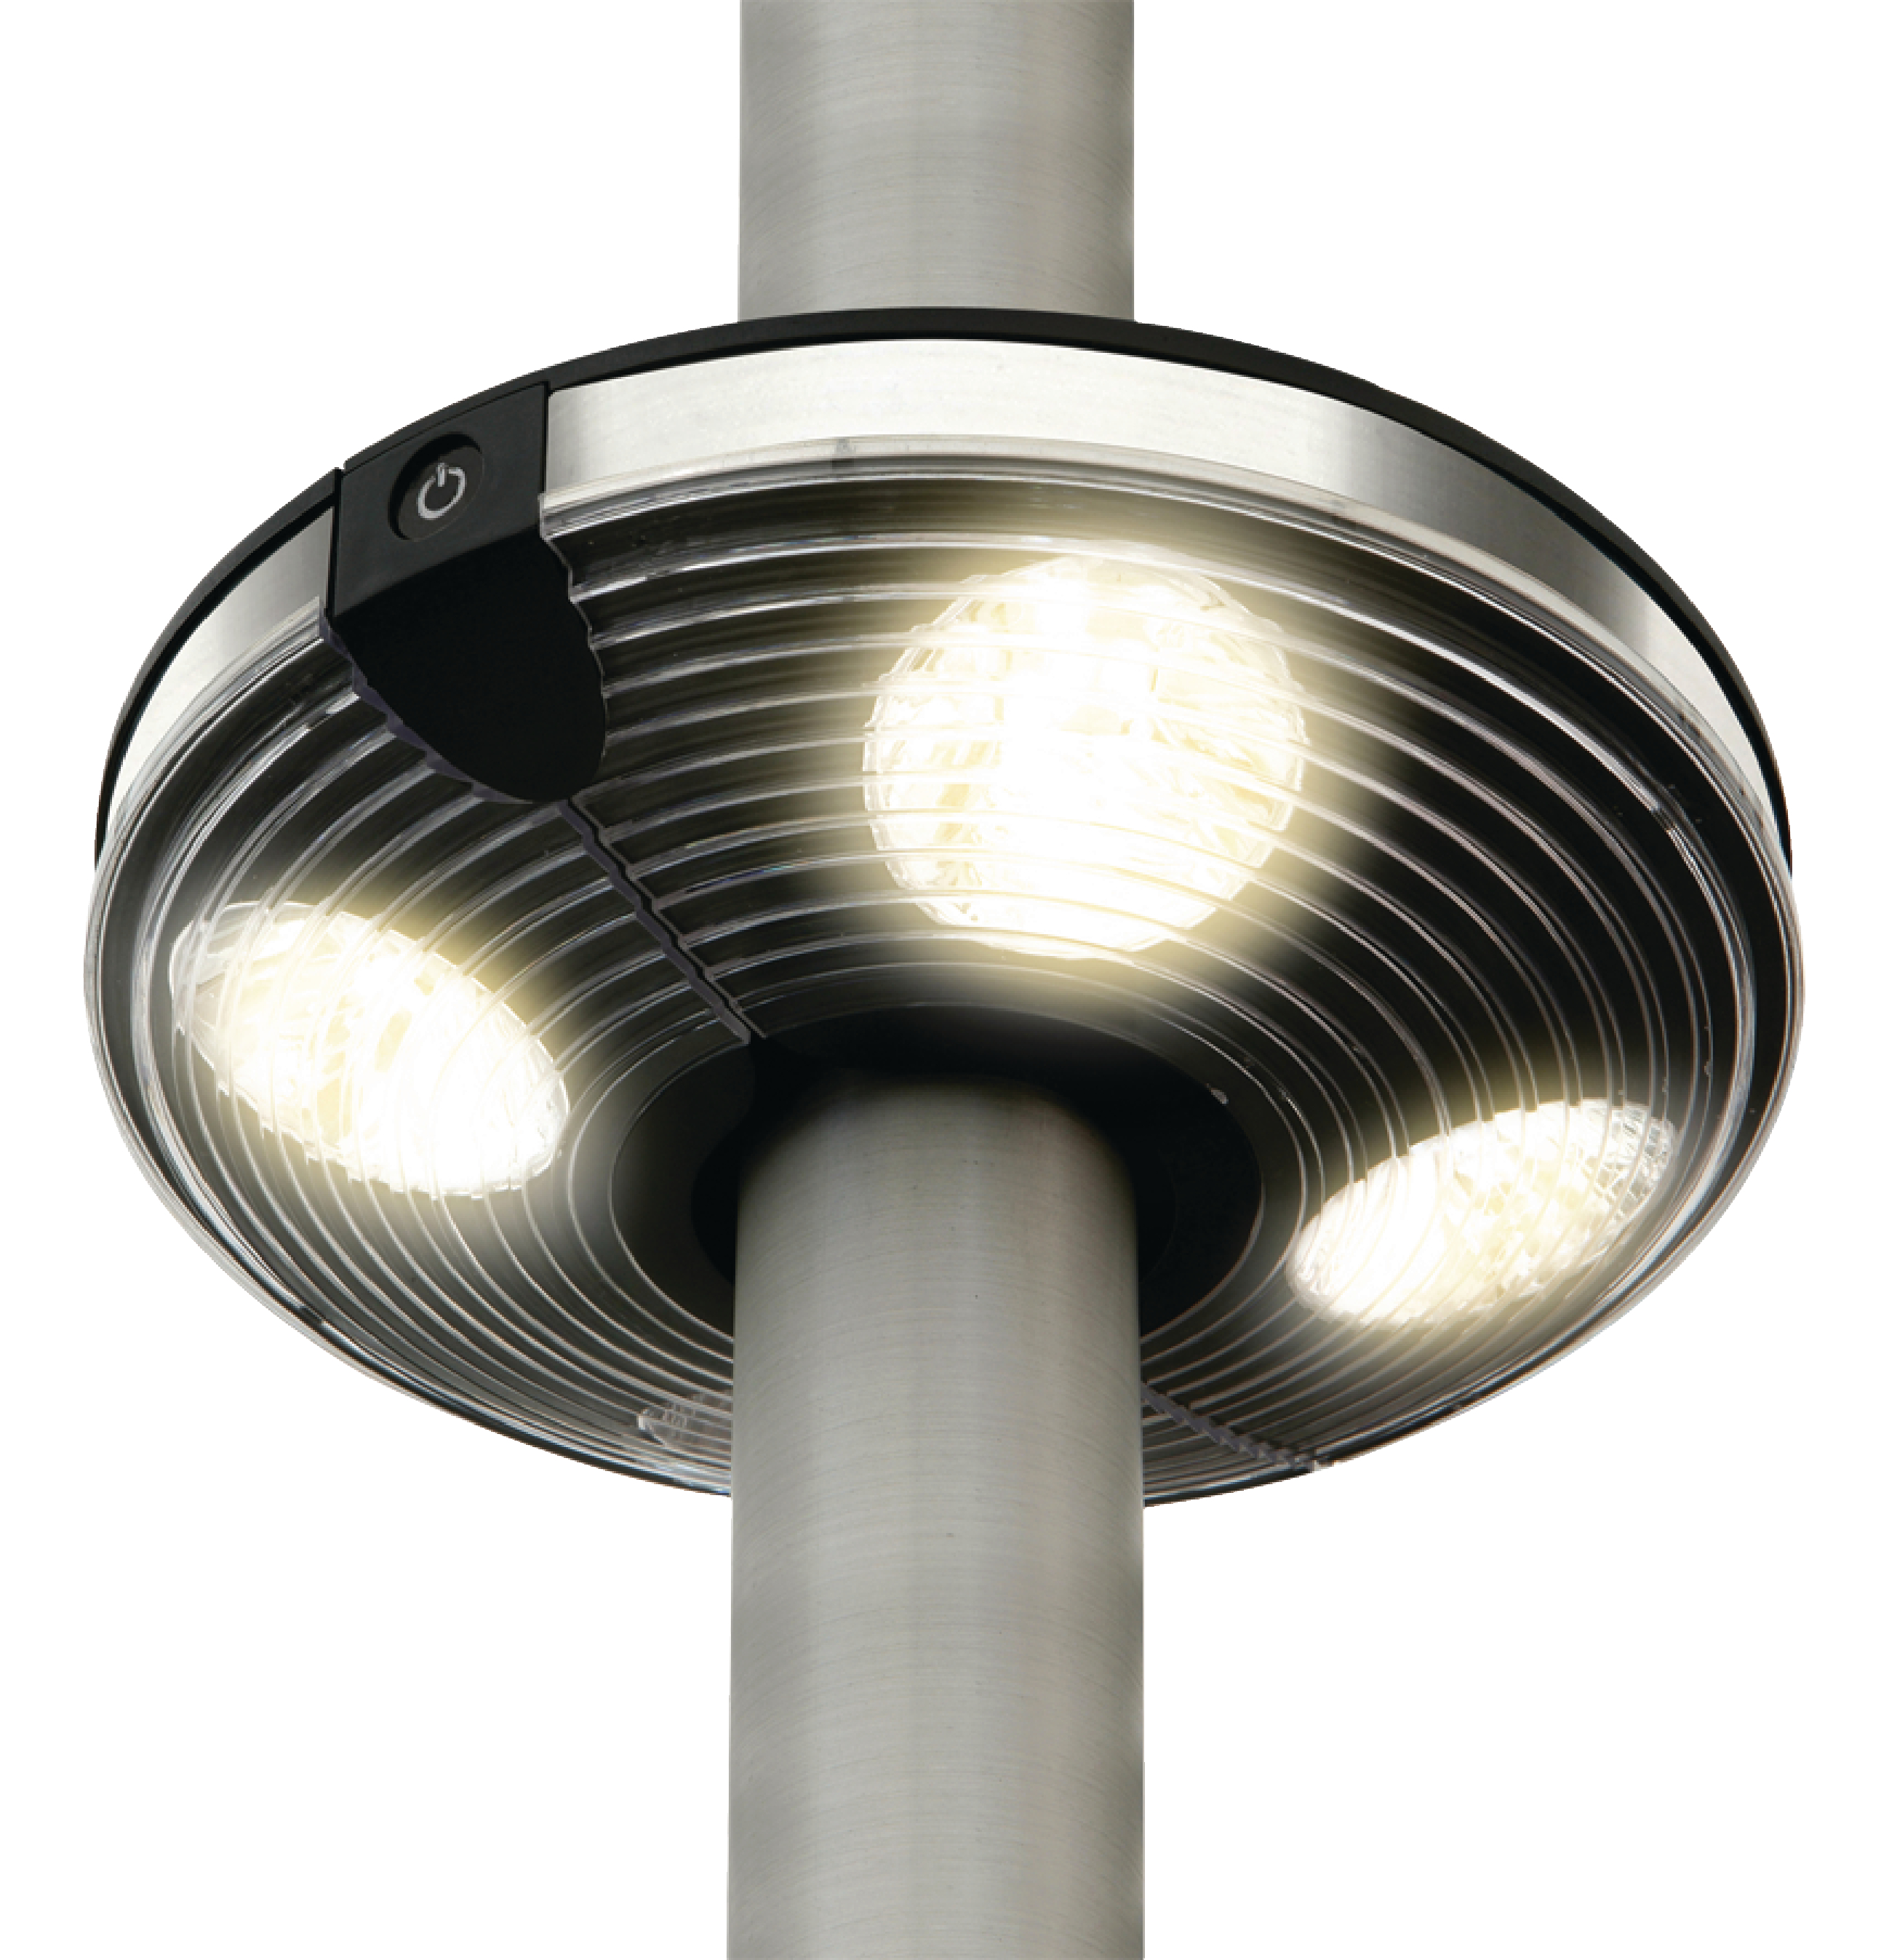 Ra 5000377 ranex led parasol light 15 lm electronic - Parasol prix discount ...